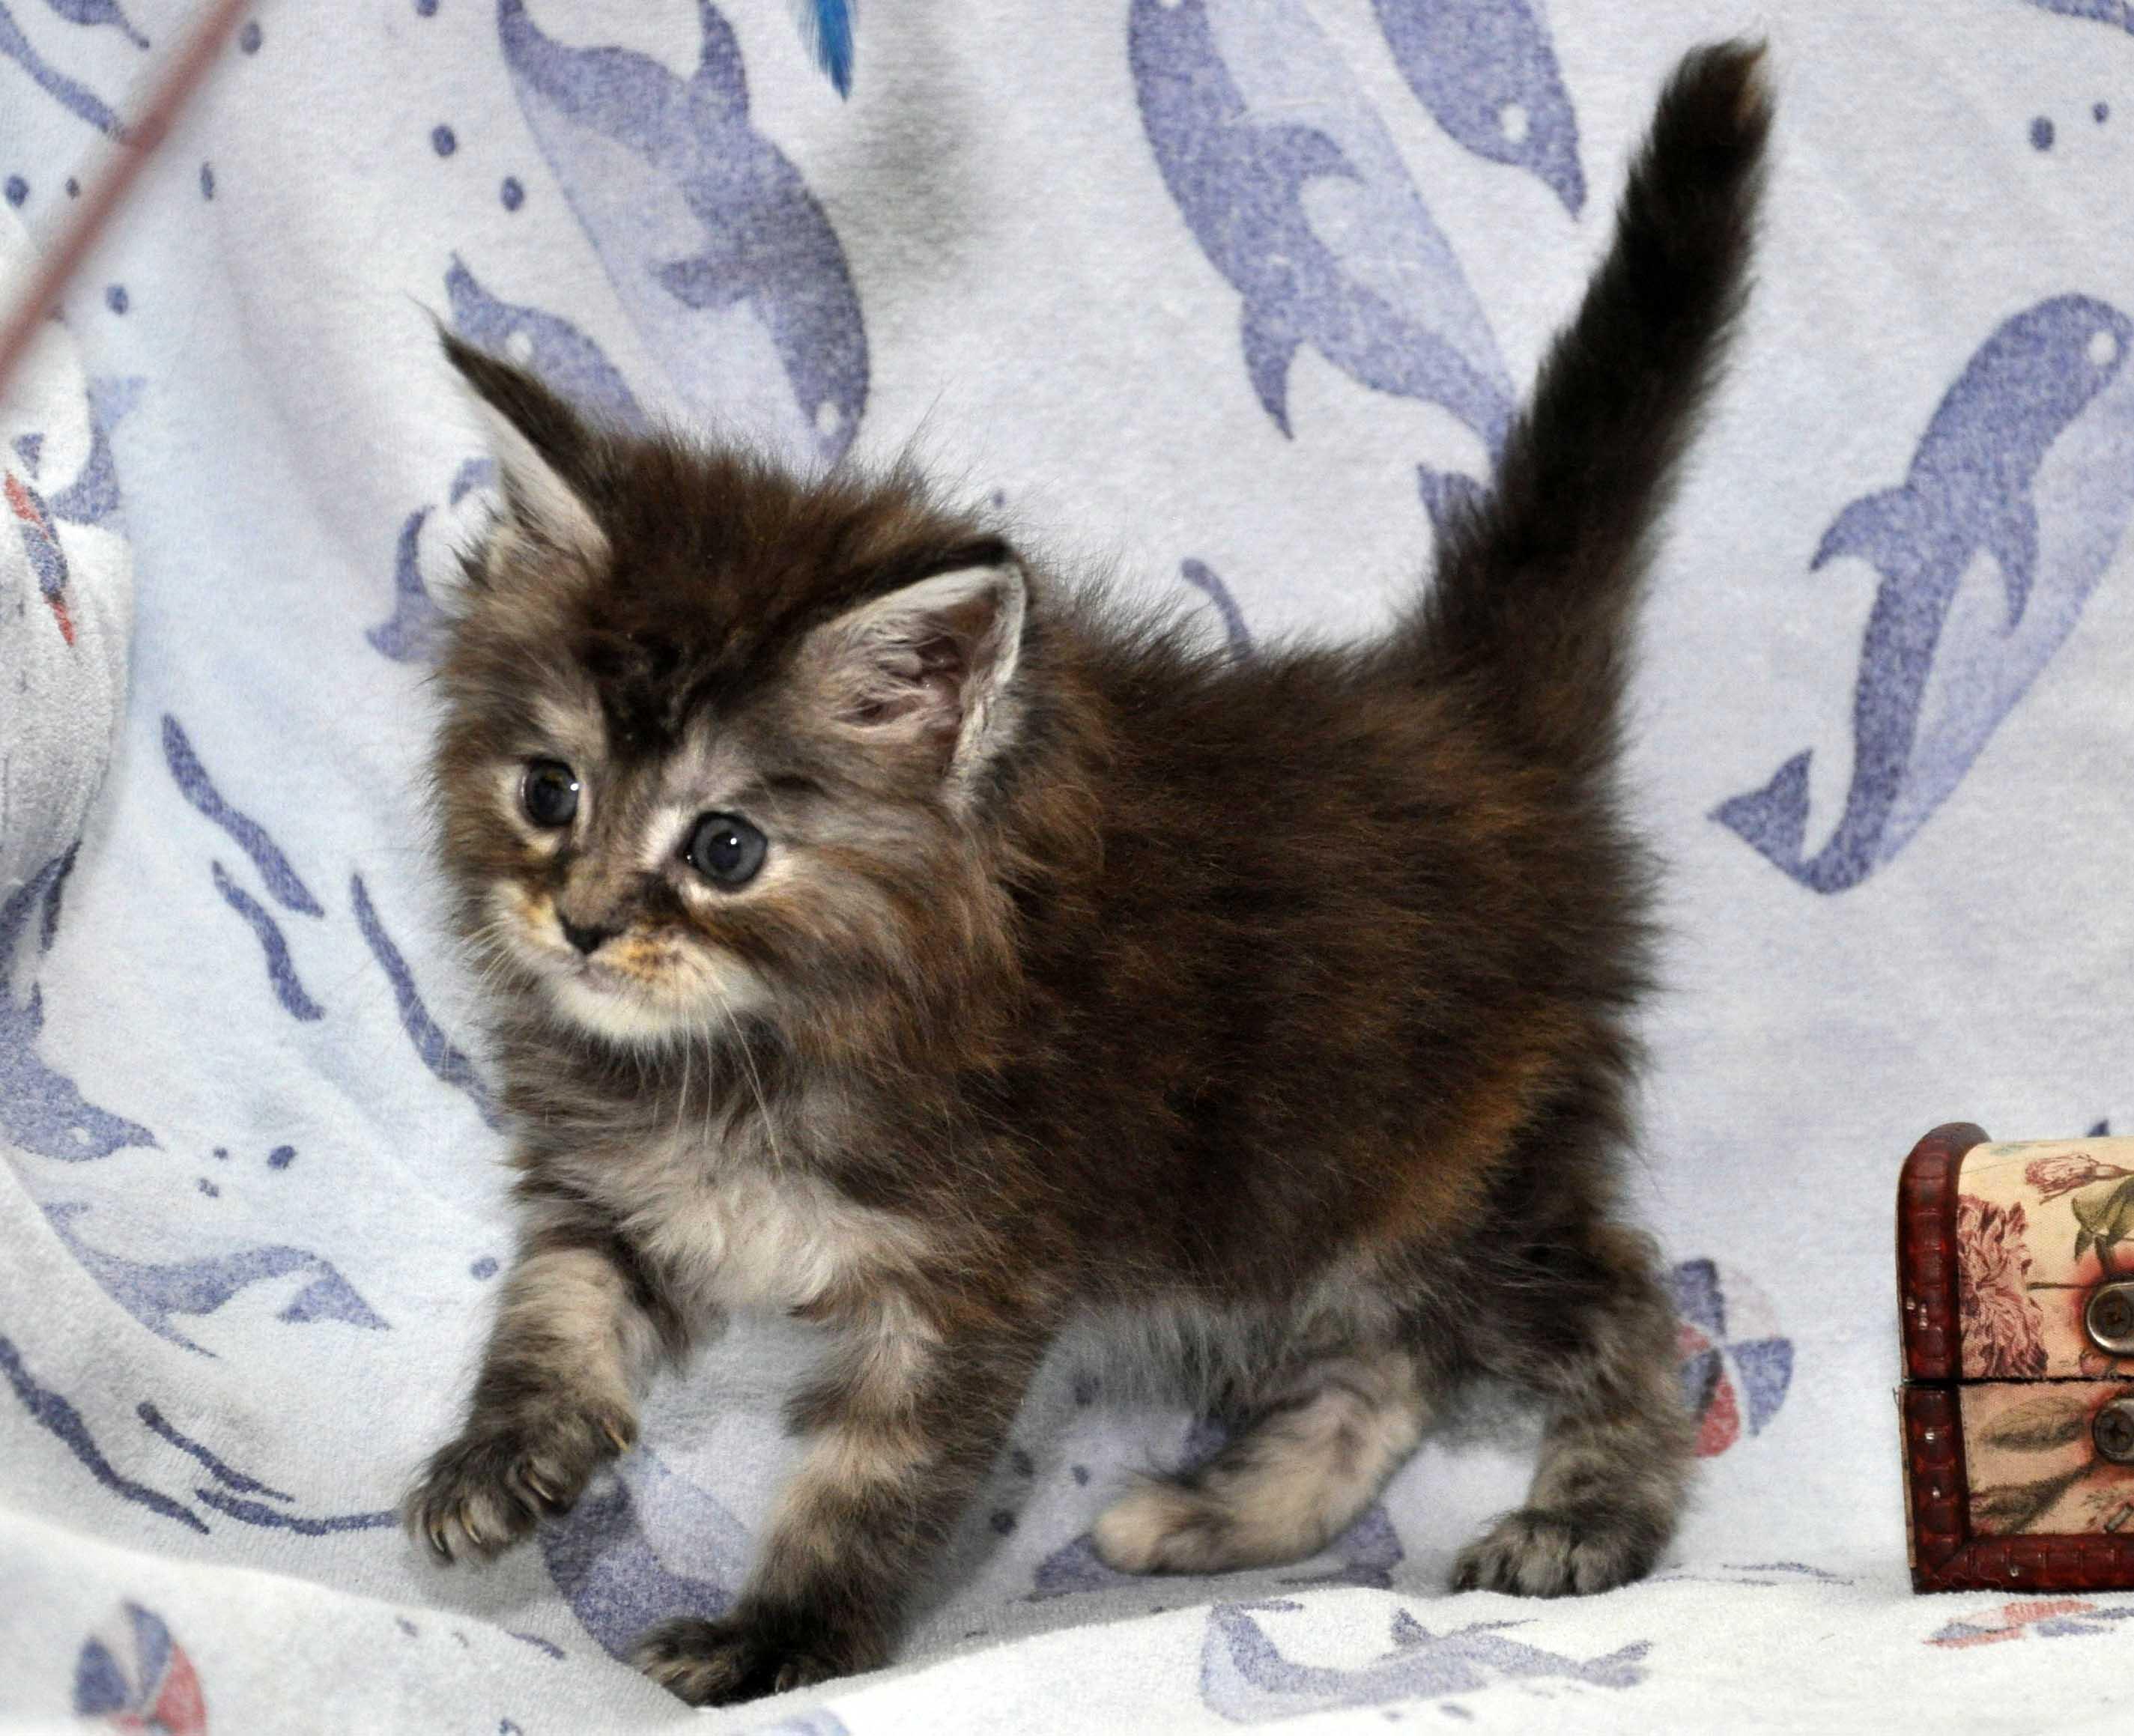 18.11.2017 г.Кошка Мейн Кун 1 female Eyktan P 24122017 foto 4